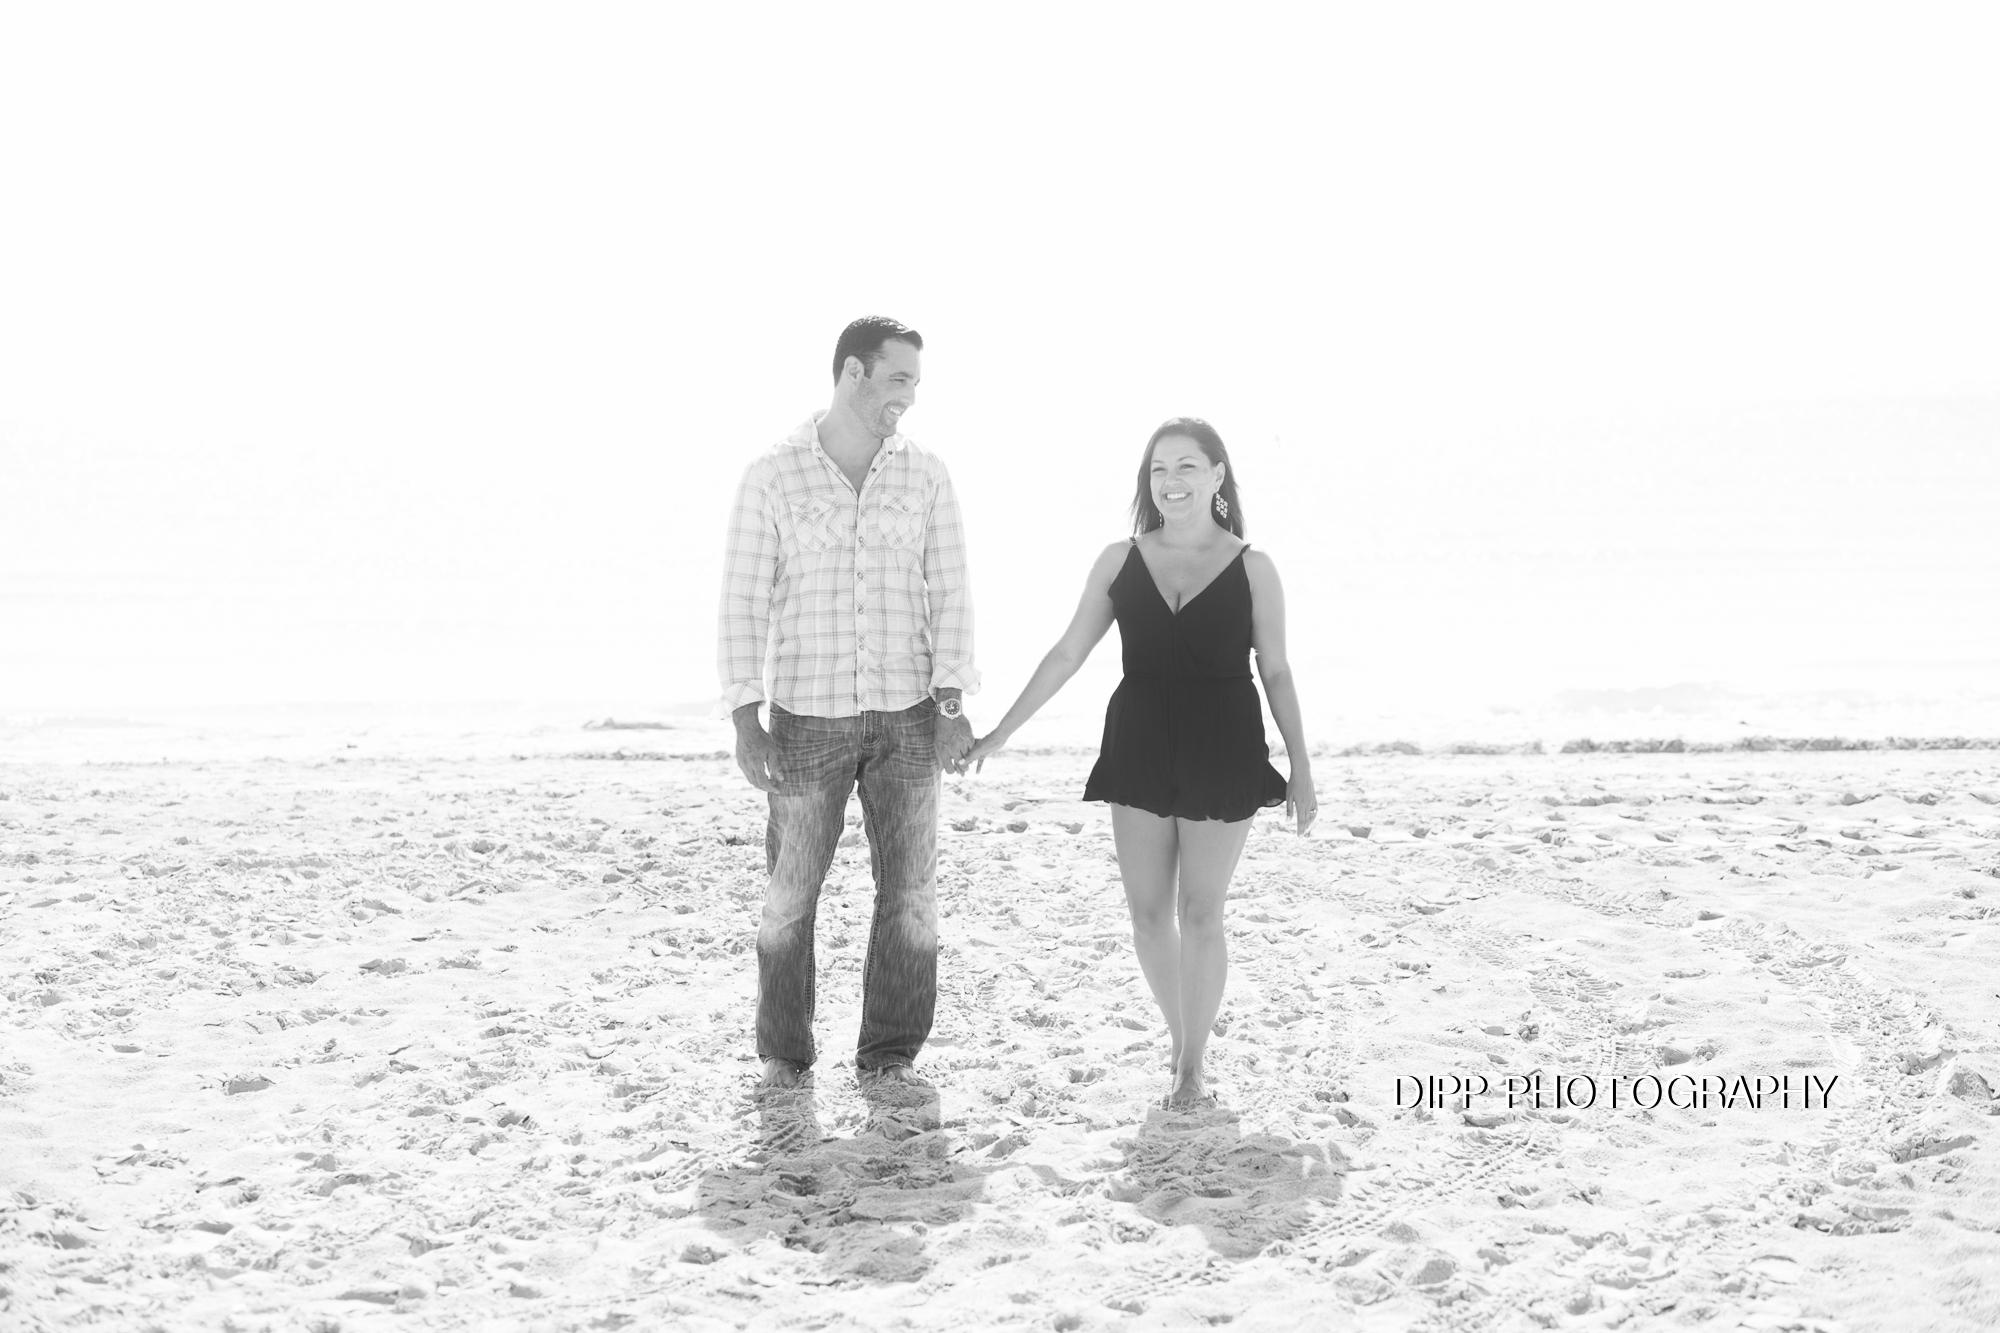 Dipp_2016 Brandon & Sara Mini Engagement Session-54-Edit